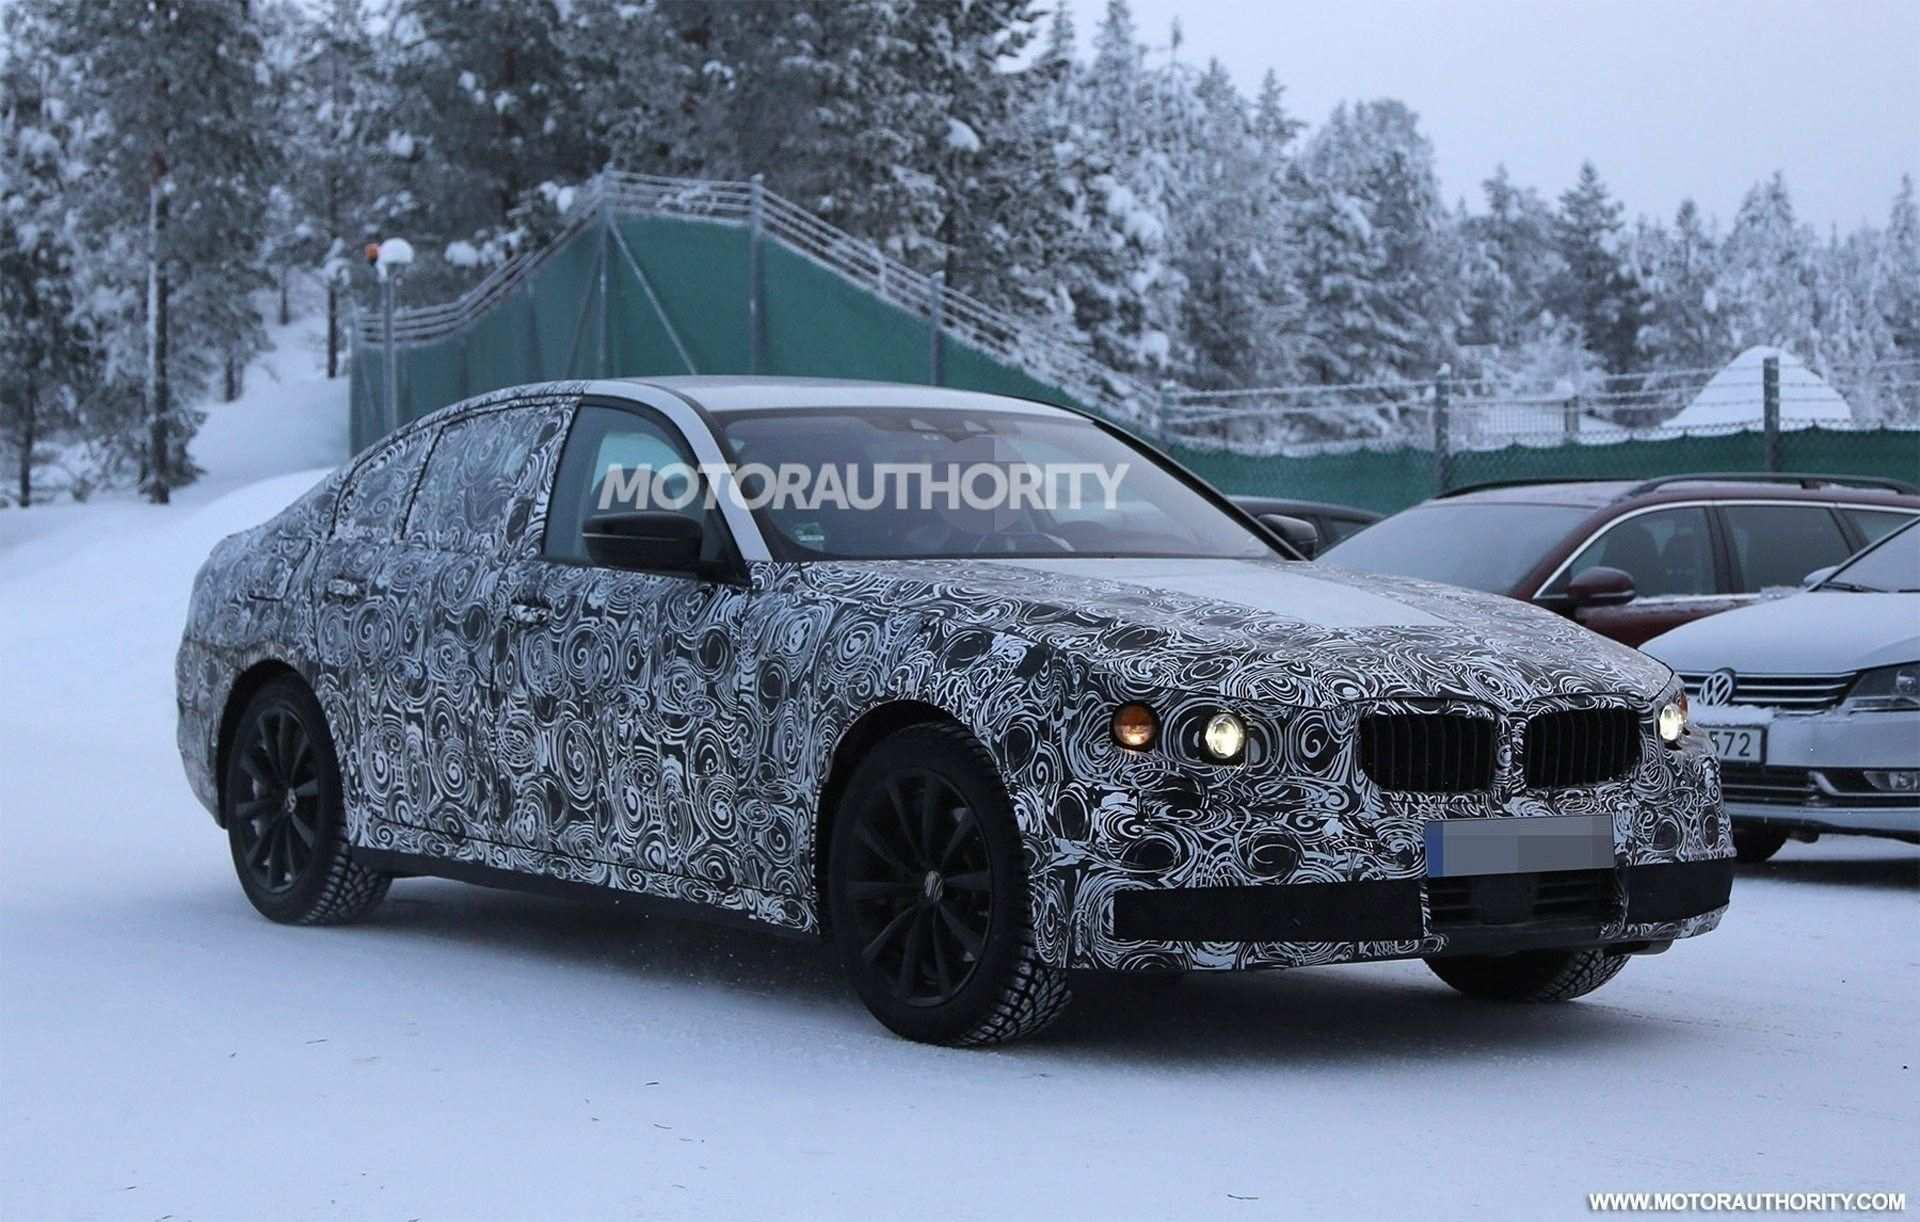 34 All New 2020 BMW 3 Series Edrive Phev Spesification by 2020 BMW 3 Series Edrive Phev